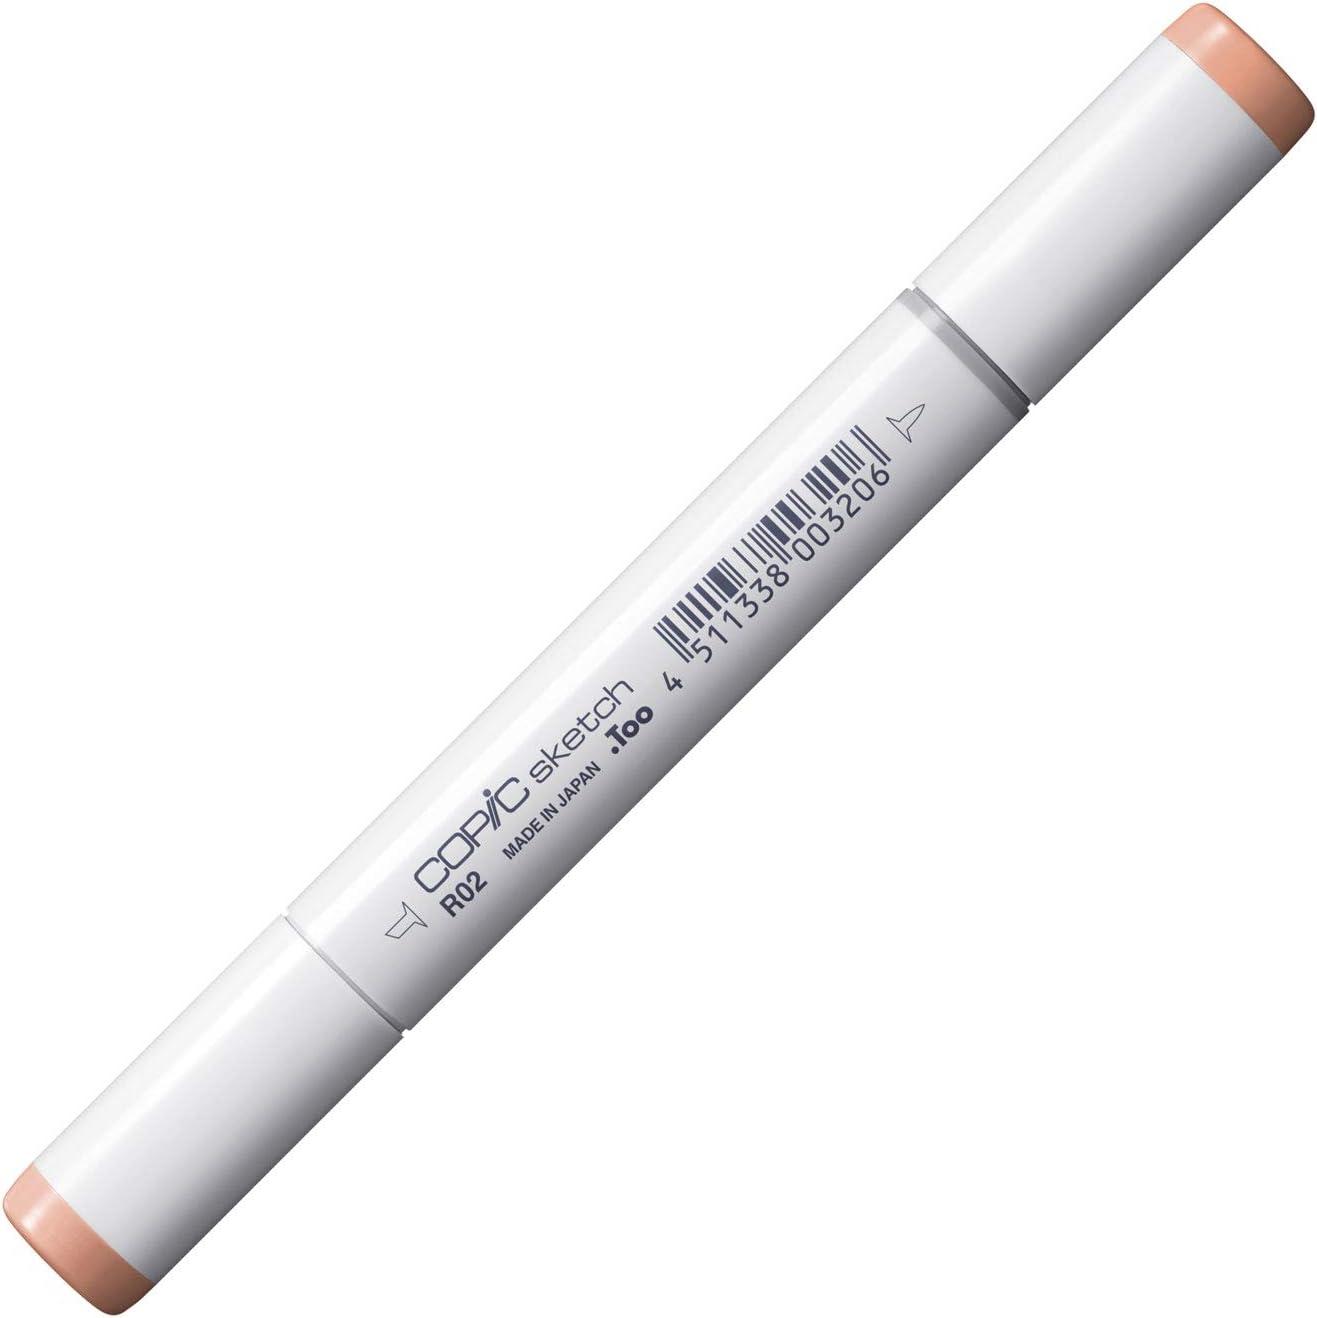 6 Copic SKETCH Markers DARK SKIN FLESH TONES Set-Alcohol Ink